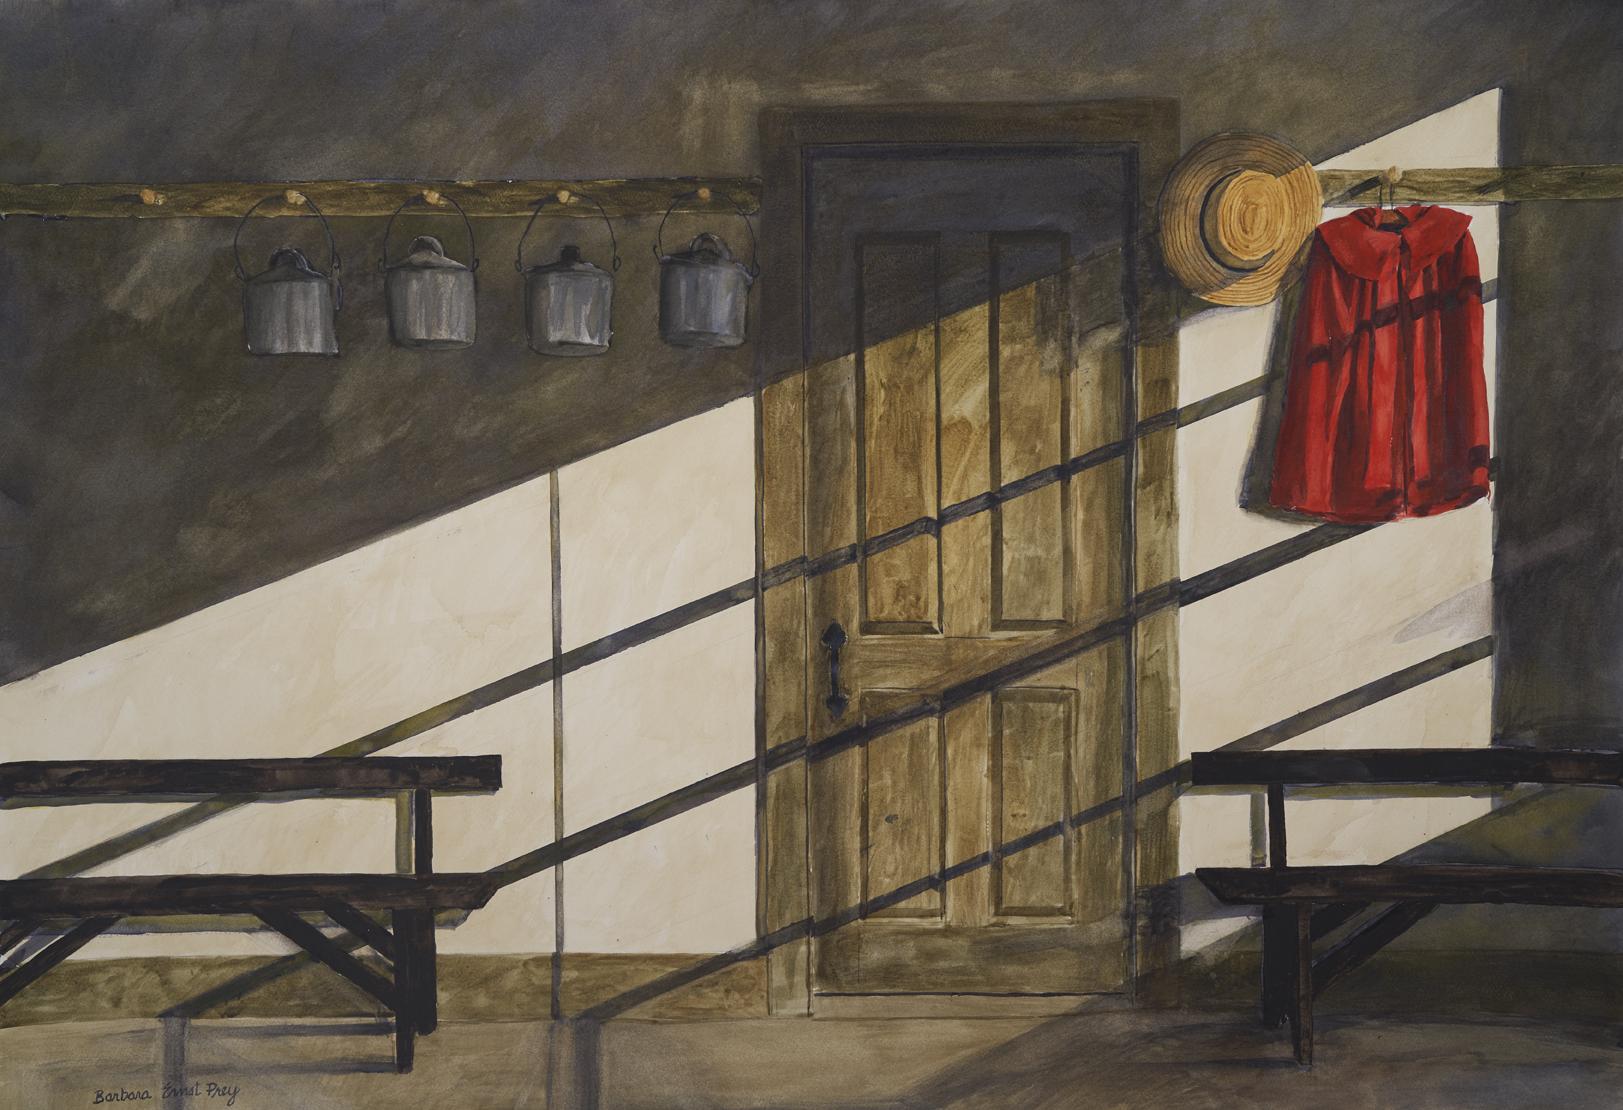 Barbara Ernst Prey, School Room, 2019, watercolor on paper; [source Hancock Shaker Village].